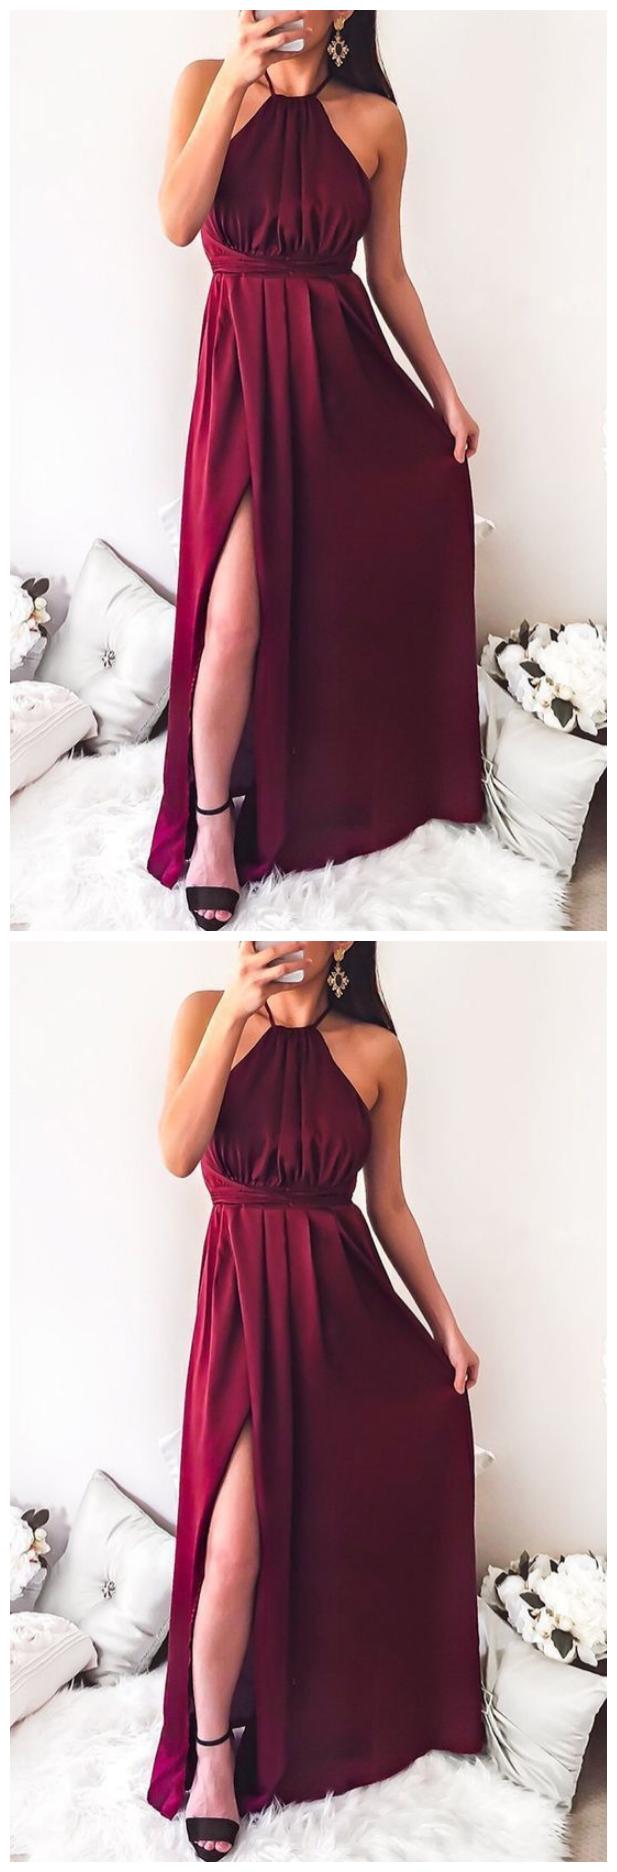 A-Line Halter Backless Floor-Length Burgundy Prom Dress with Split